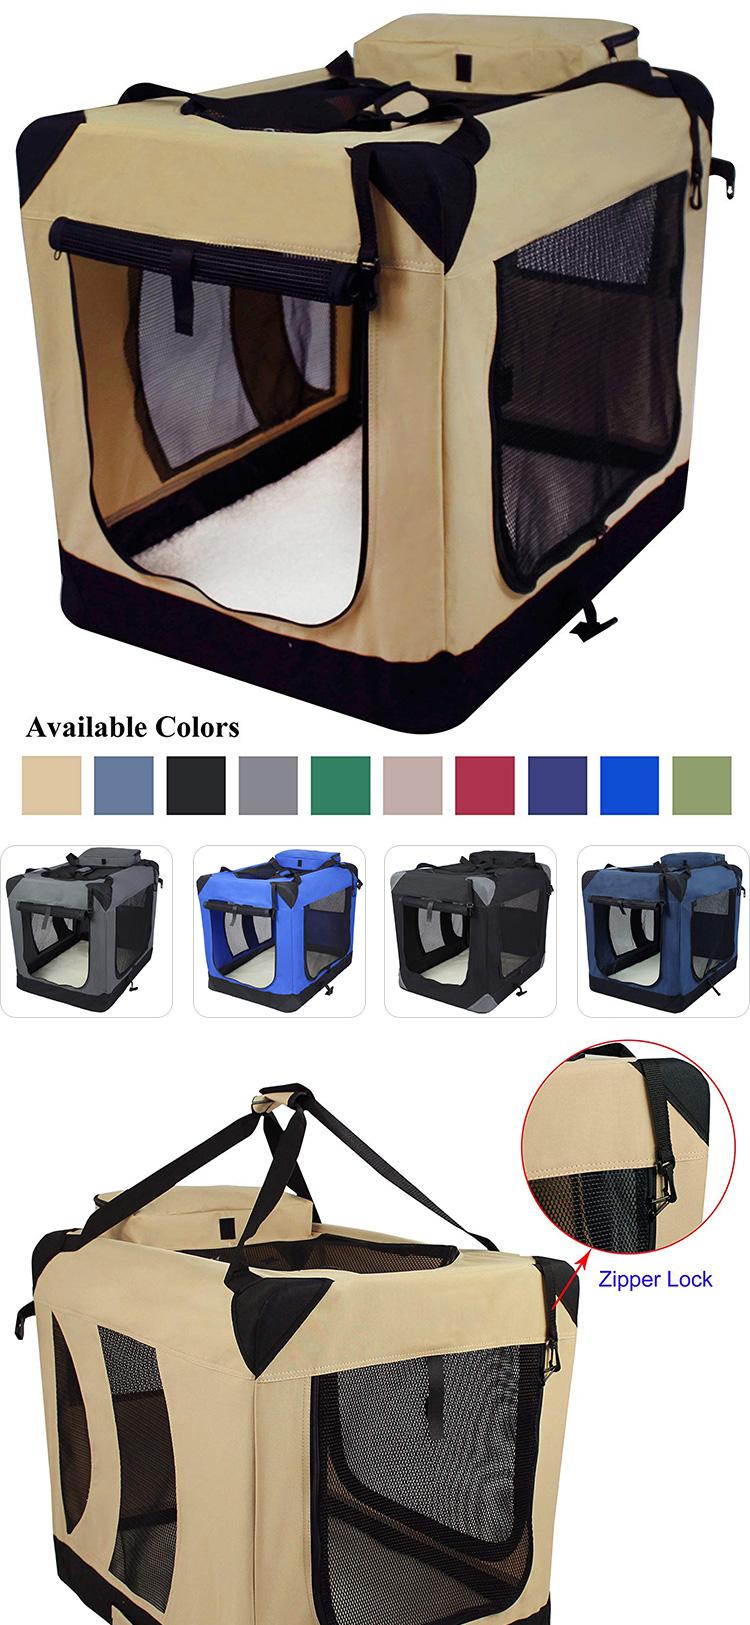 Amazon Hot Verkoop Stalen Buis Premium Folding Eenvoudige Draagbare Zachte Gewatteerde Hond Kooi Huisdier Waterdichte Stof Hond Krat Carrier Kennel